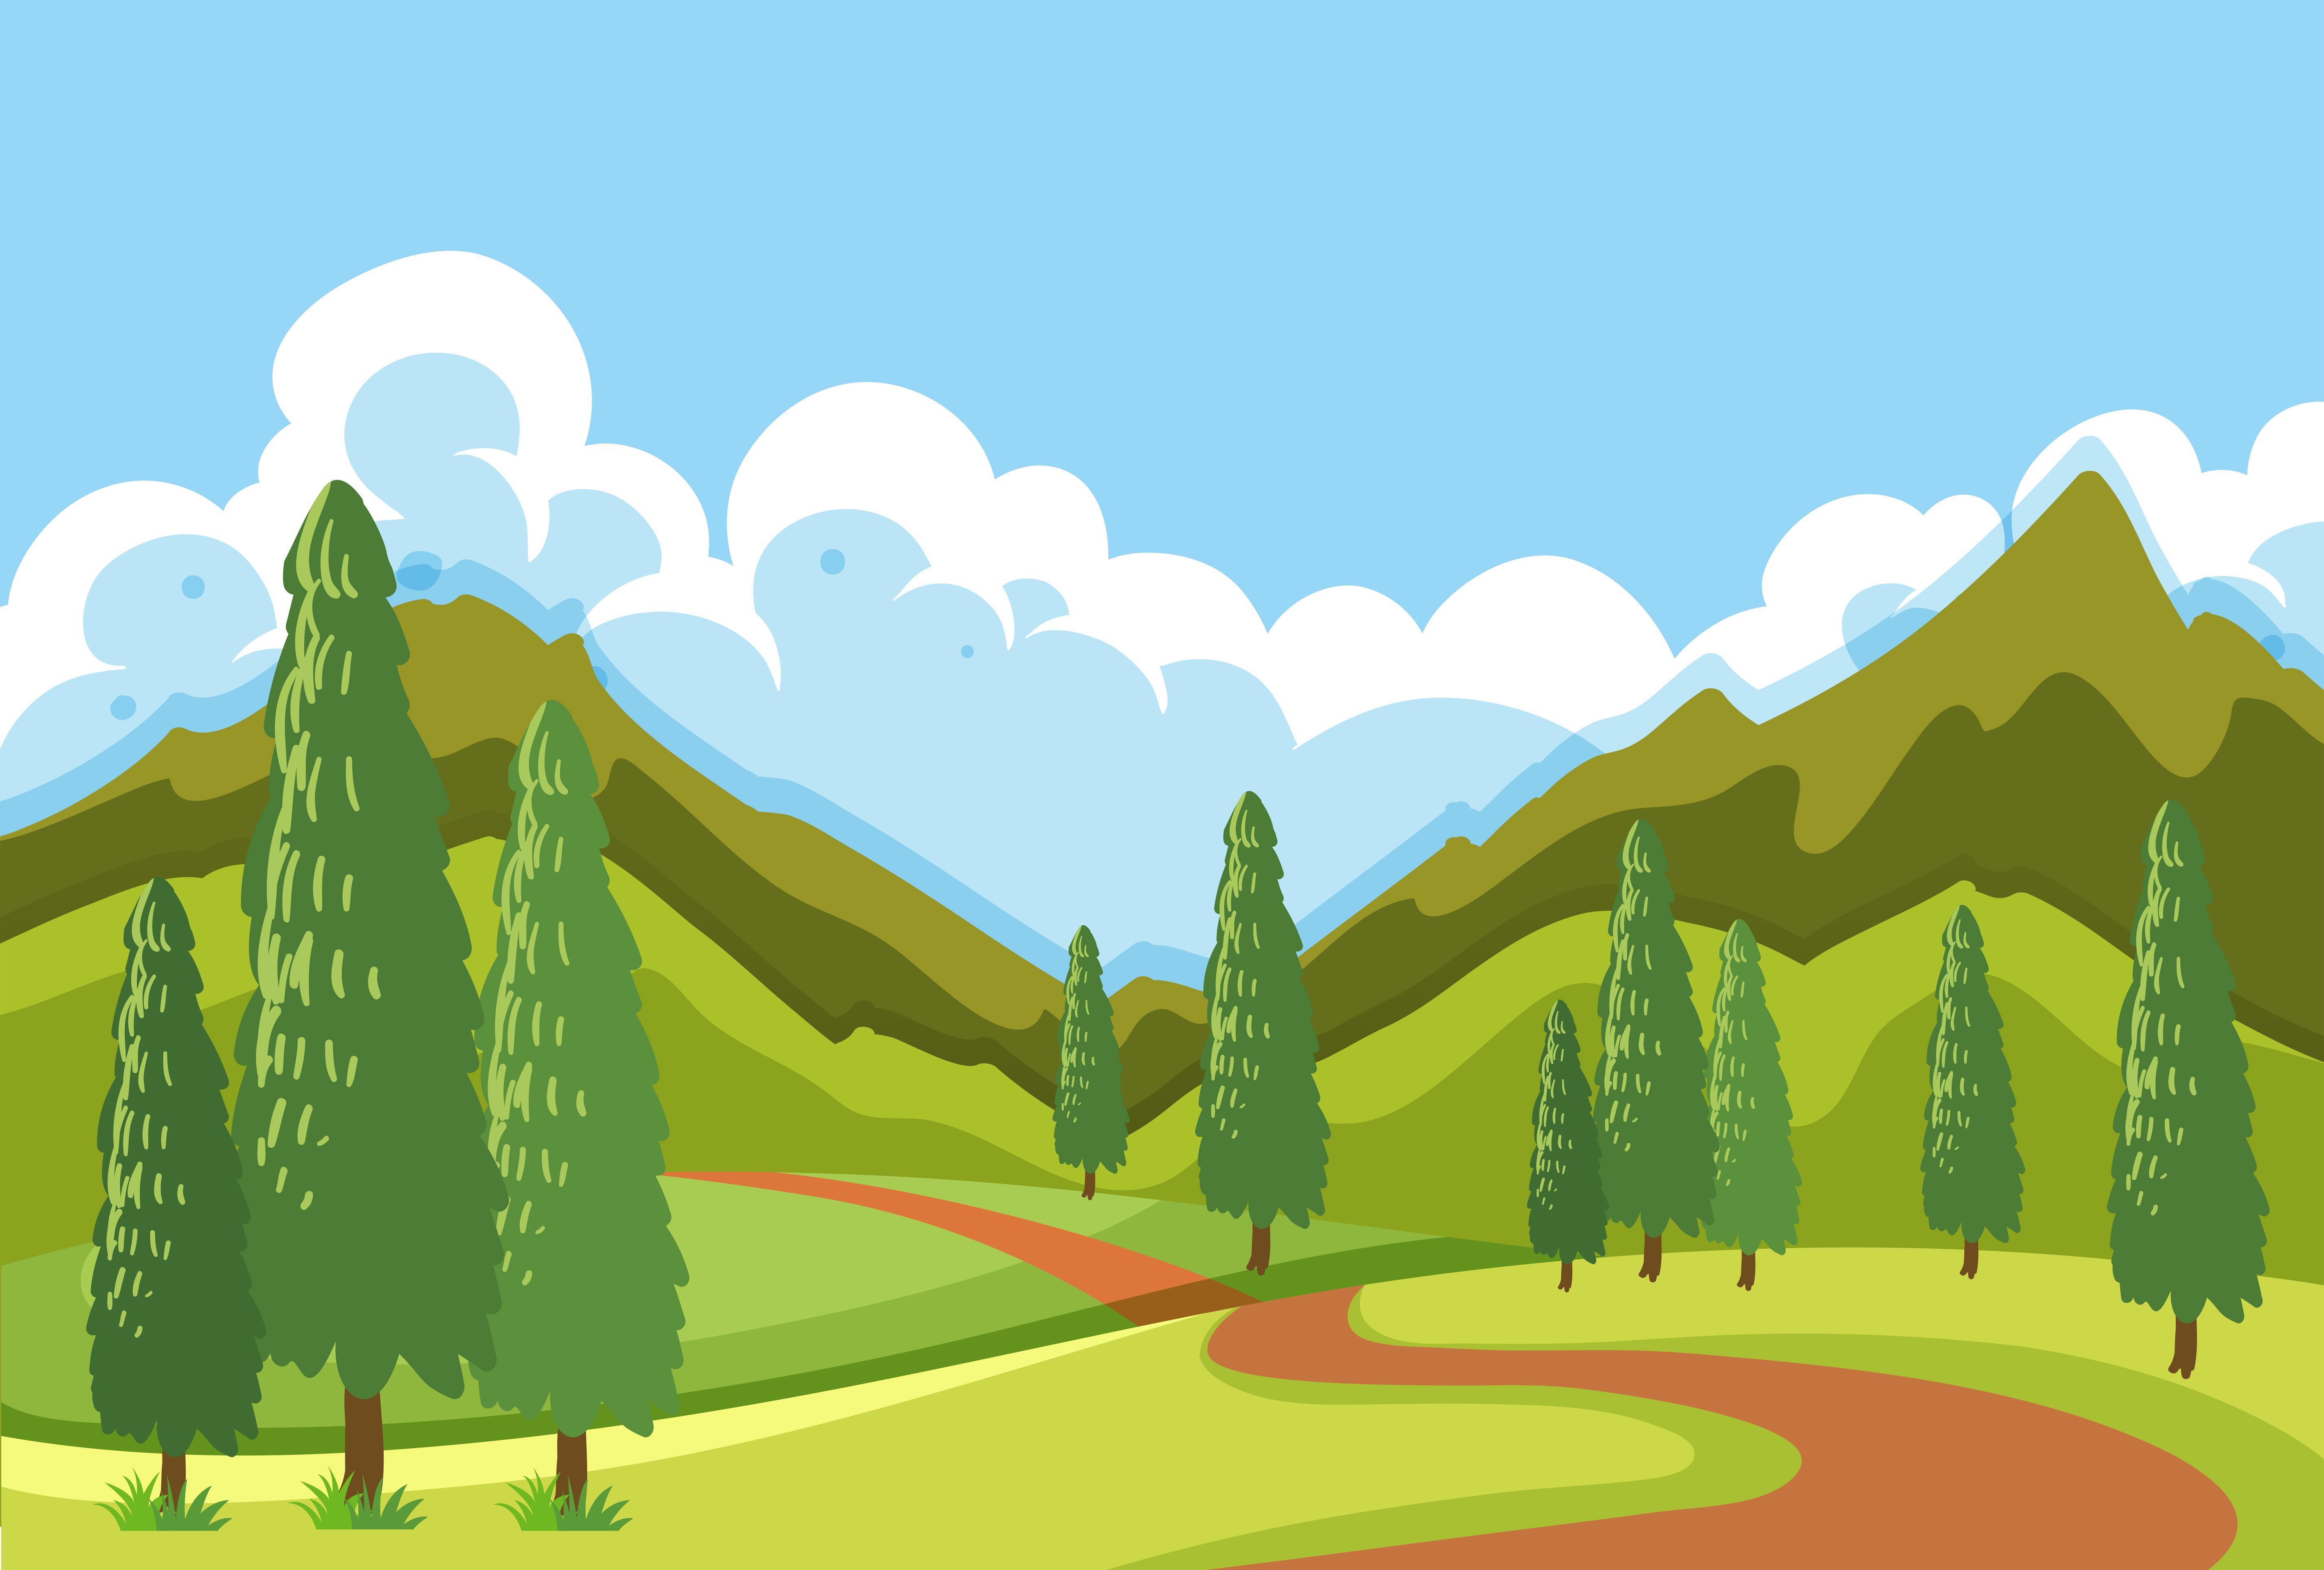 a flat mountain road landscape 444873 vector art at vecteezy